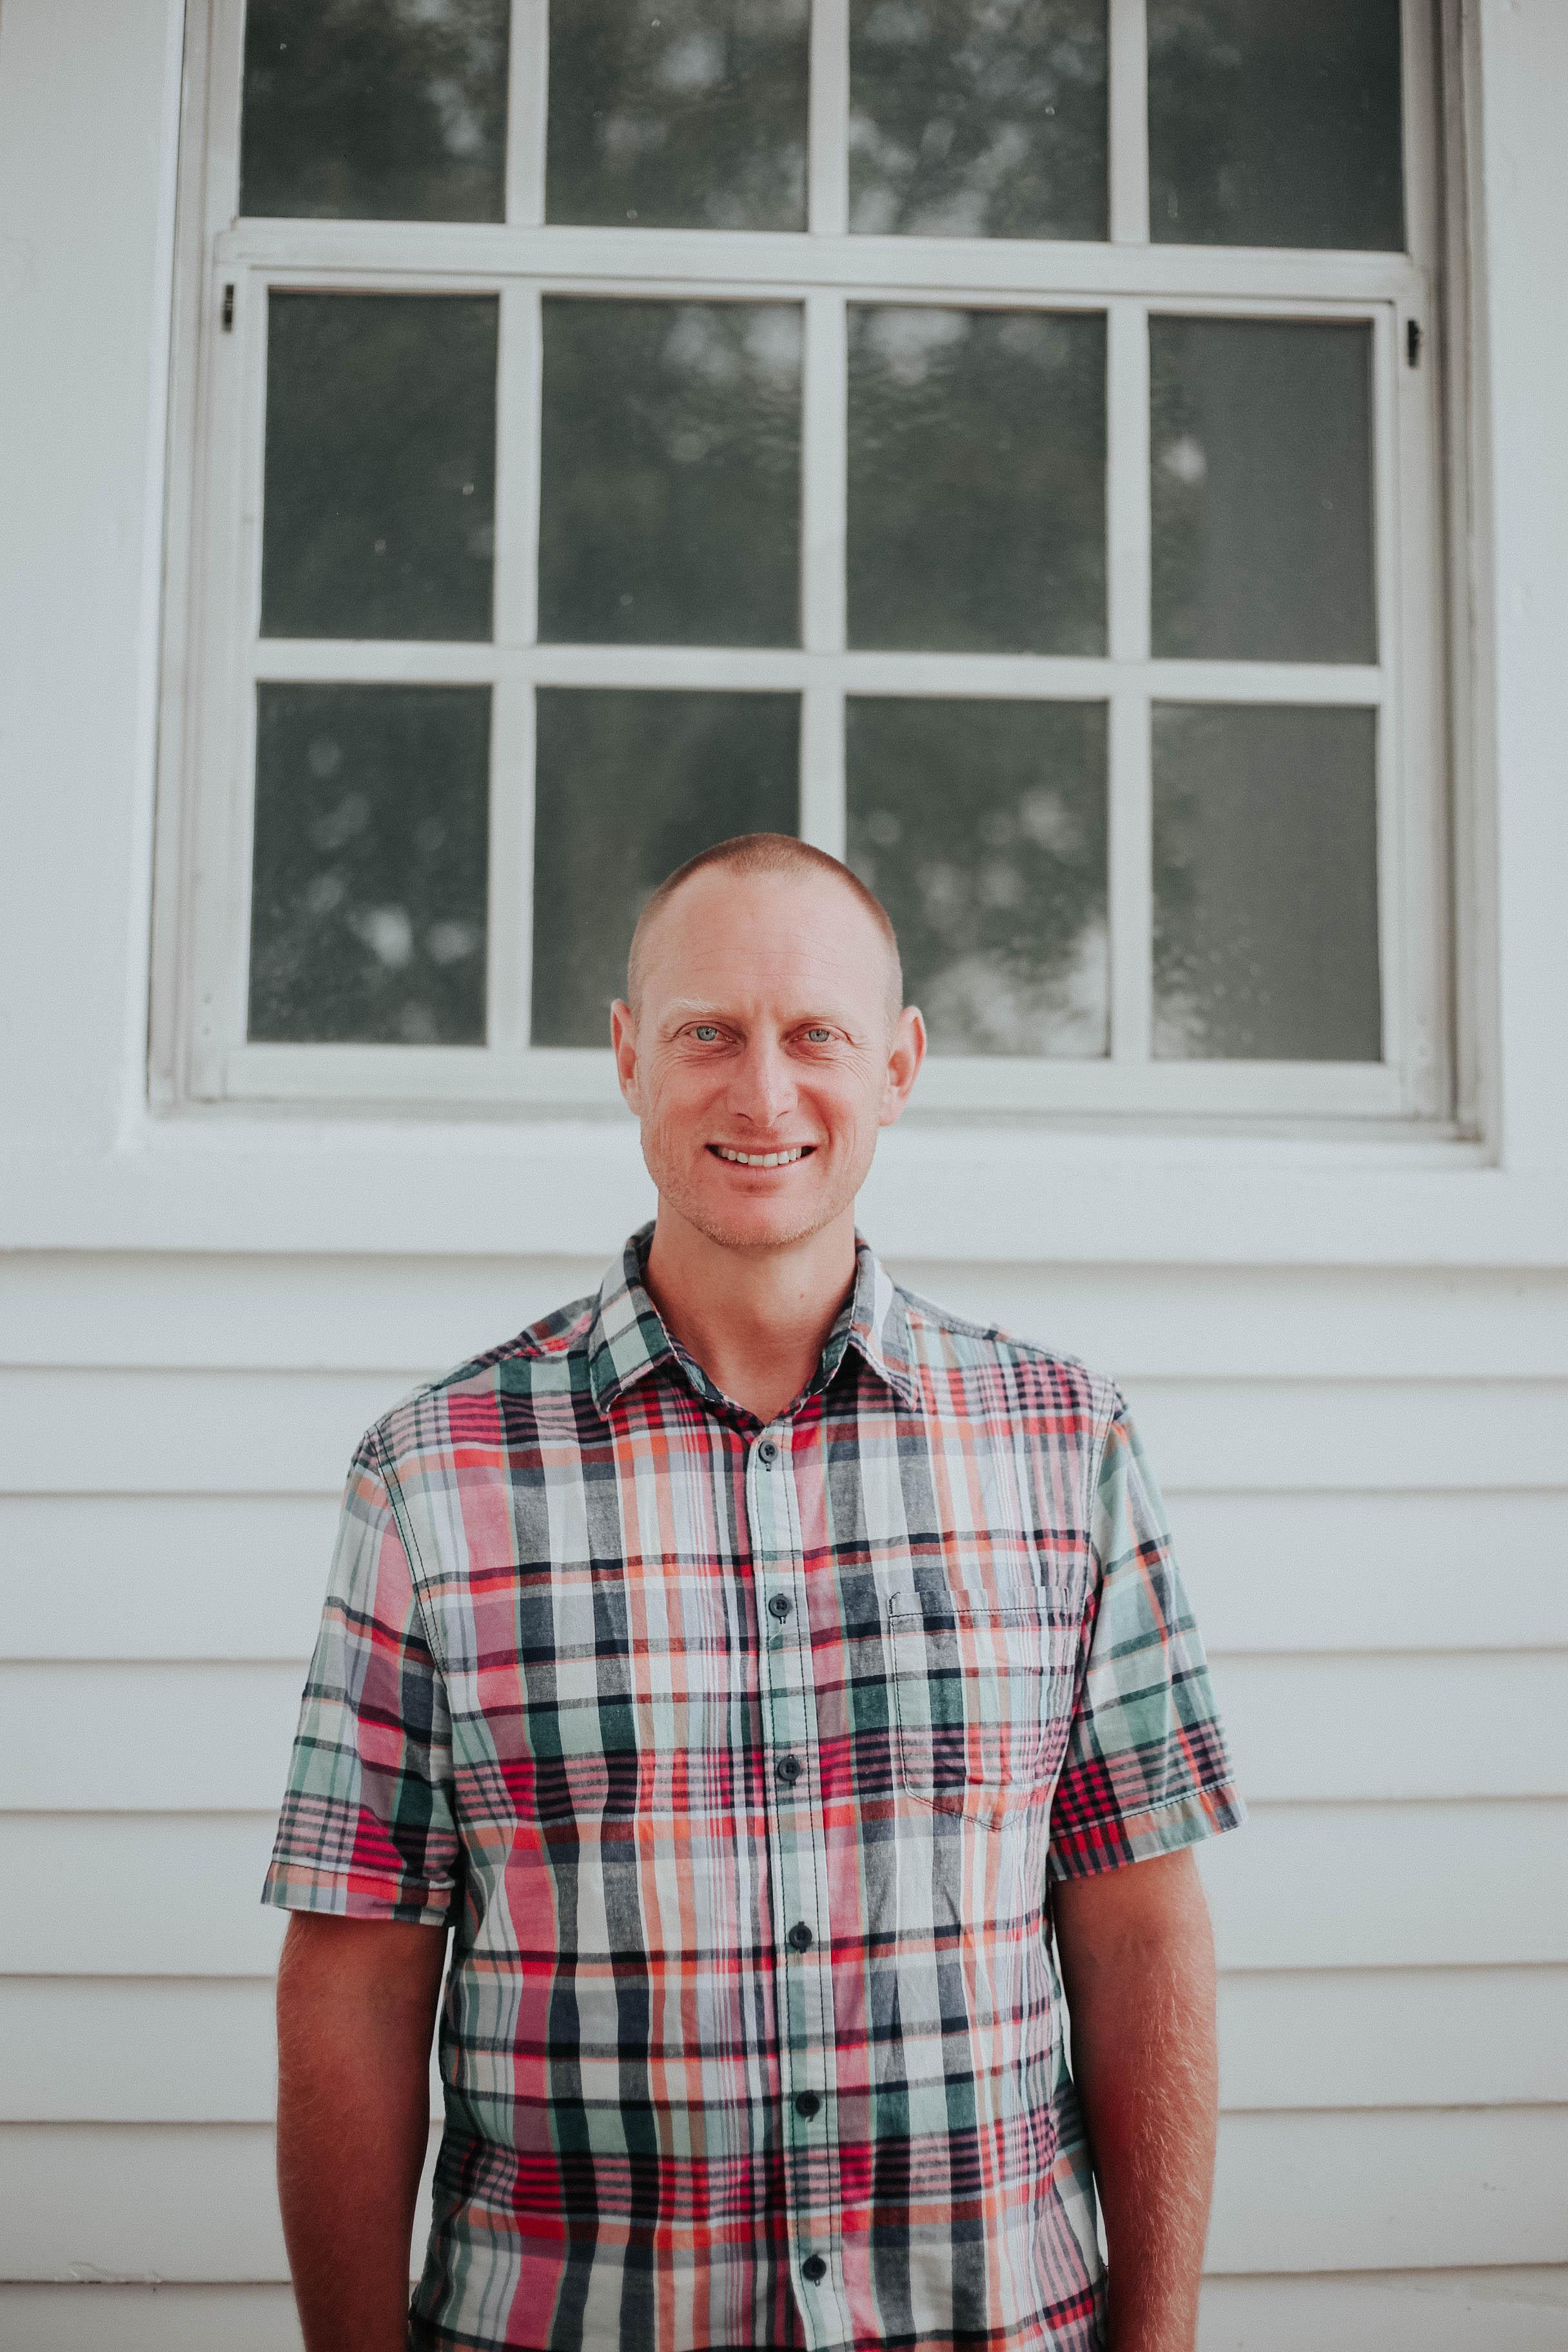 JON BROWN - Lead Pastorjon@pillarchurch.com